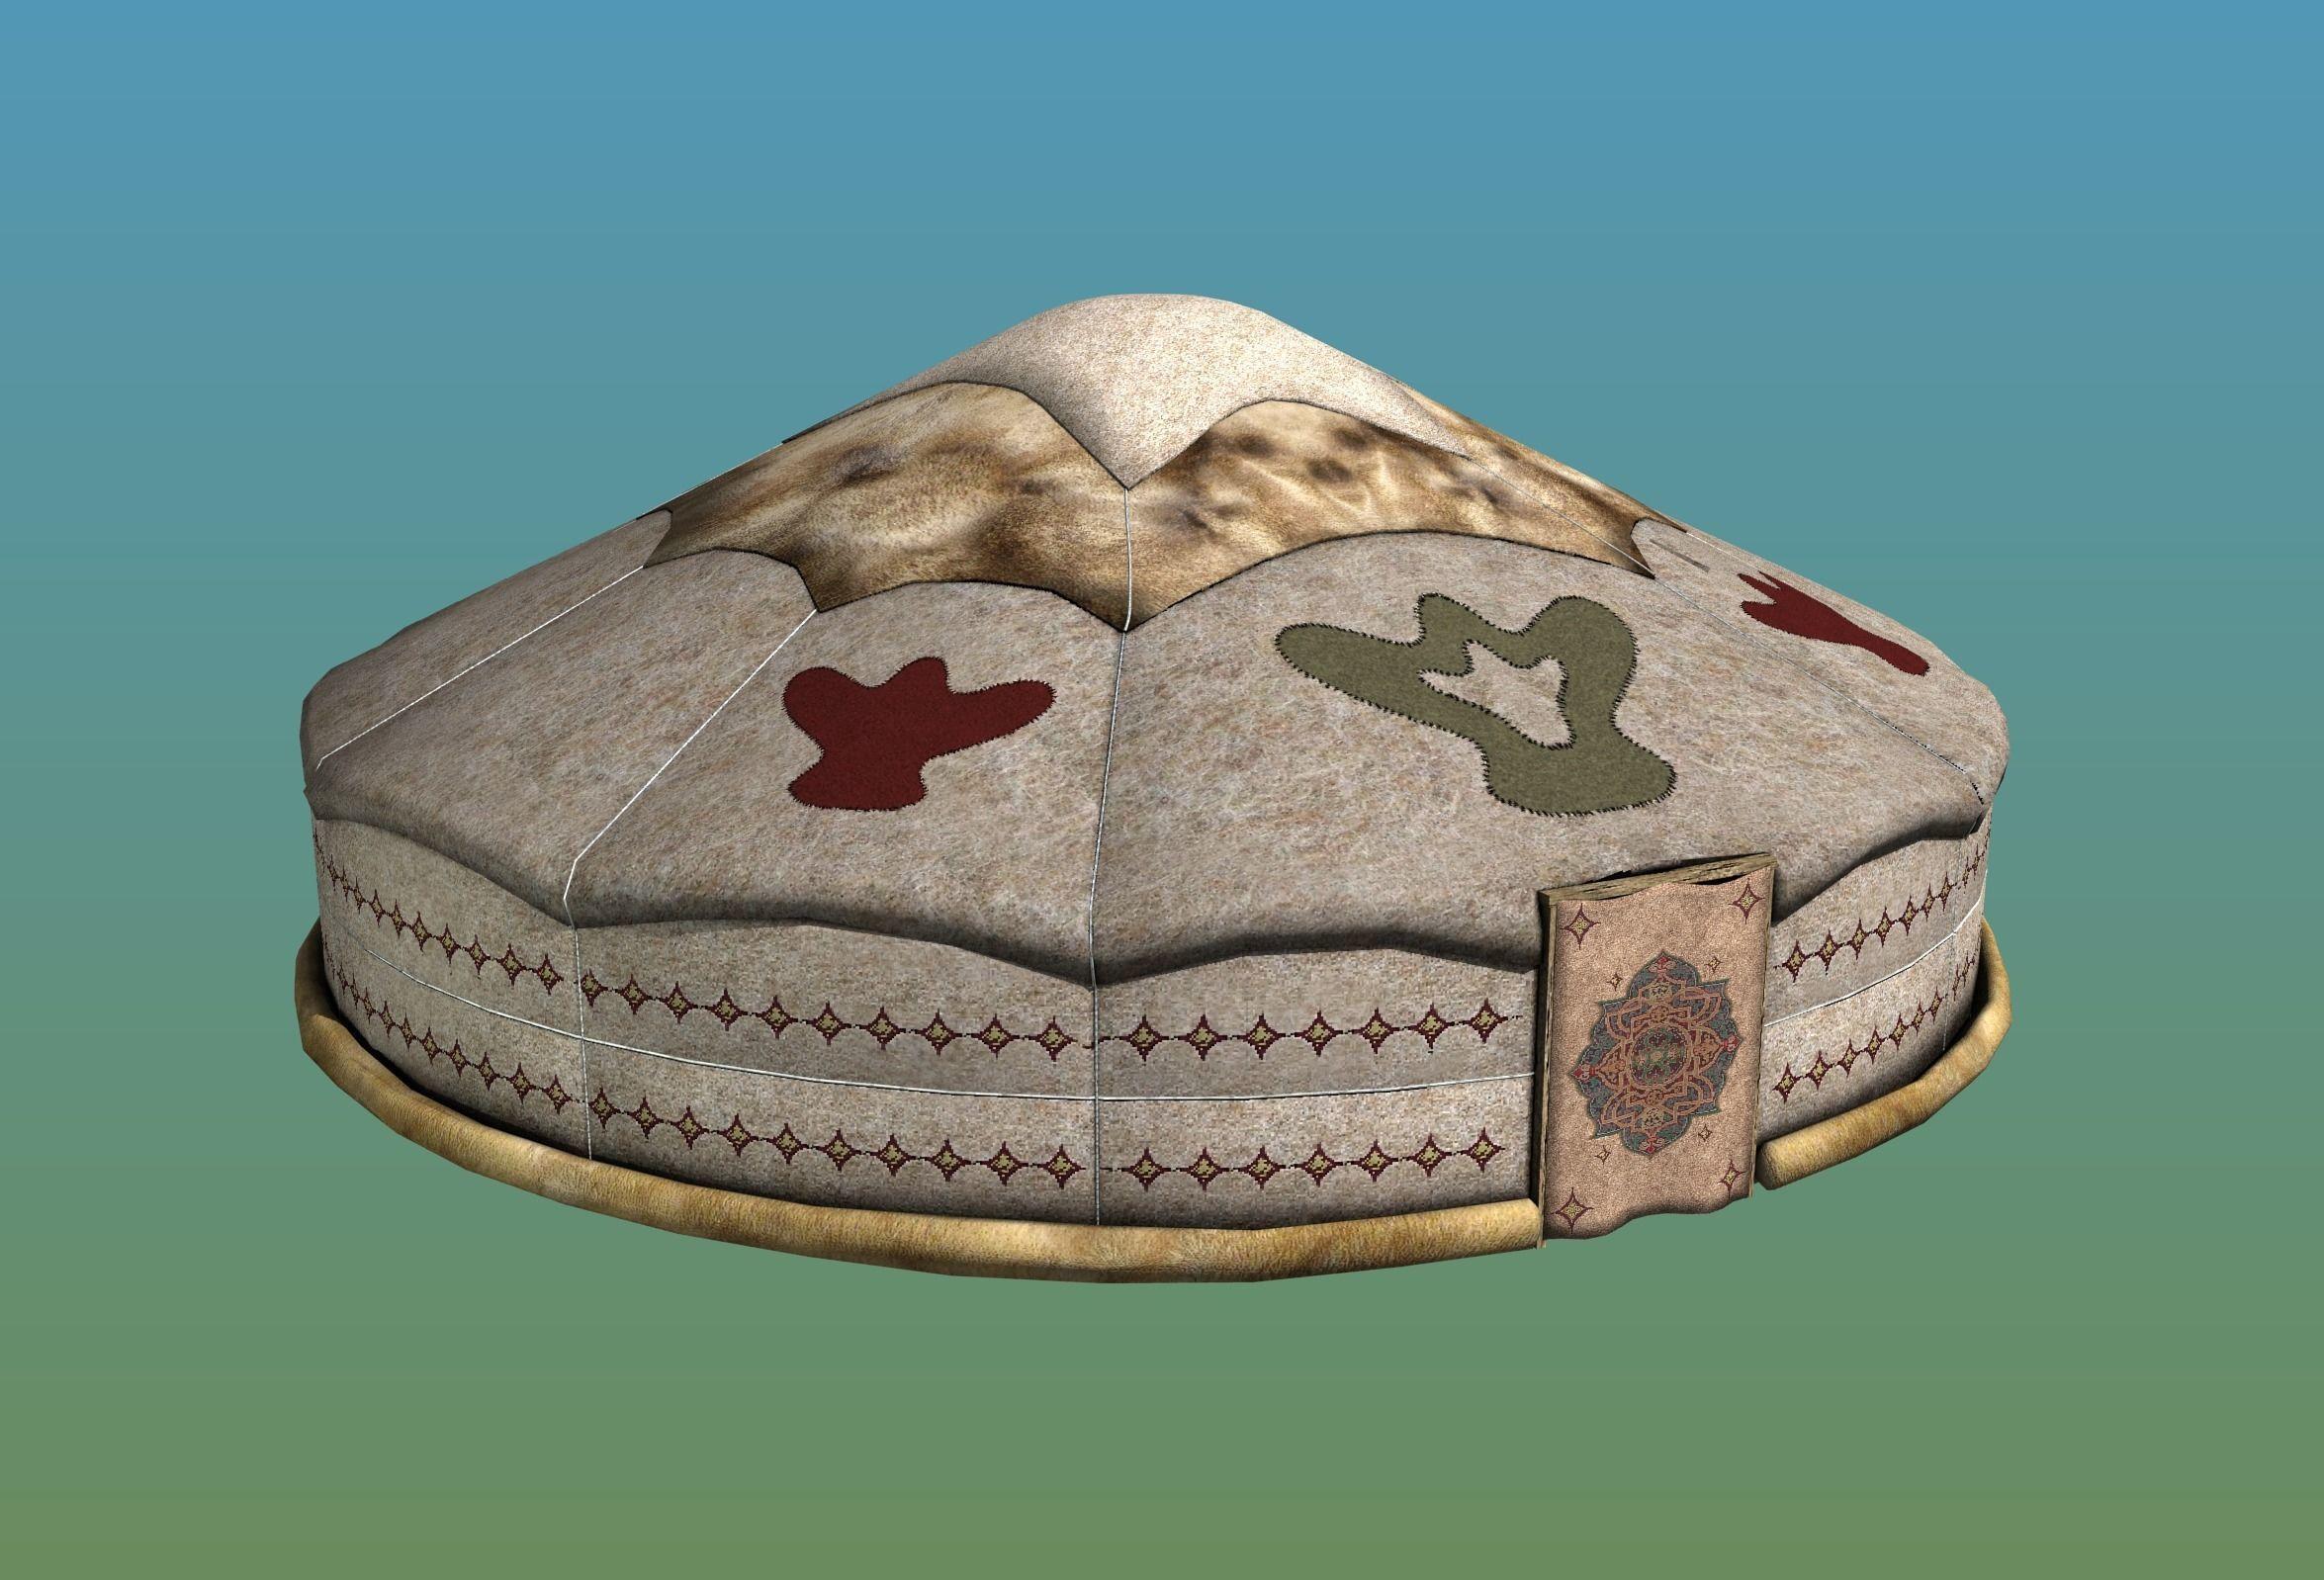 Yurt of the Khan